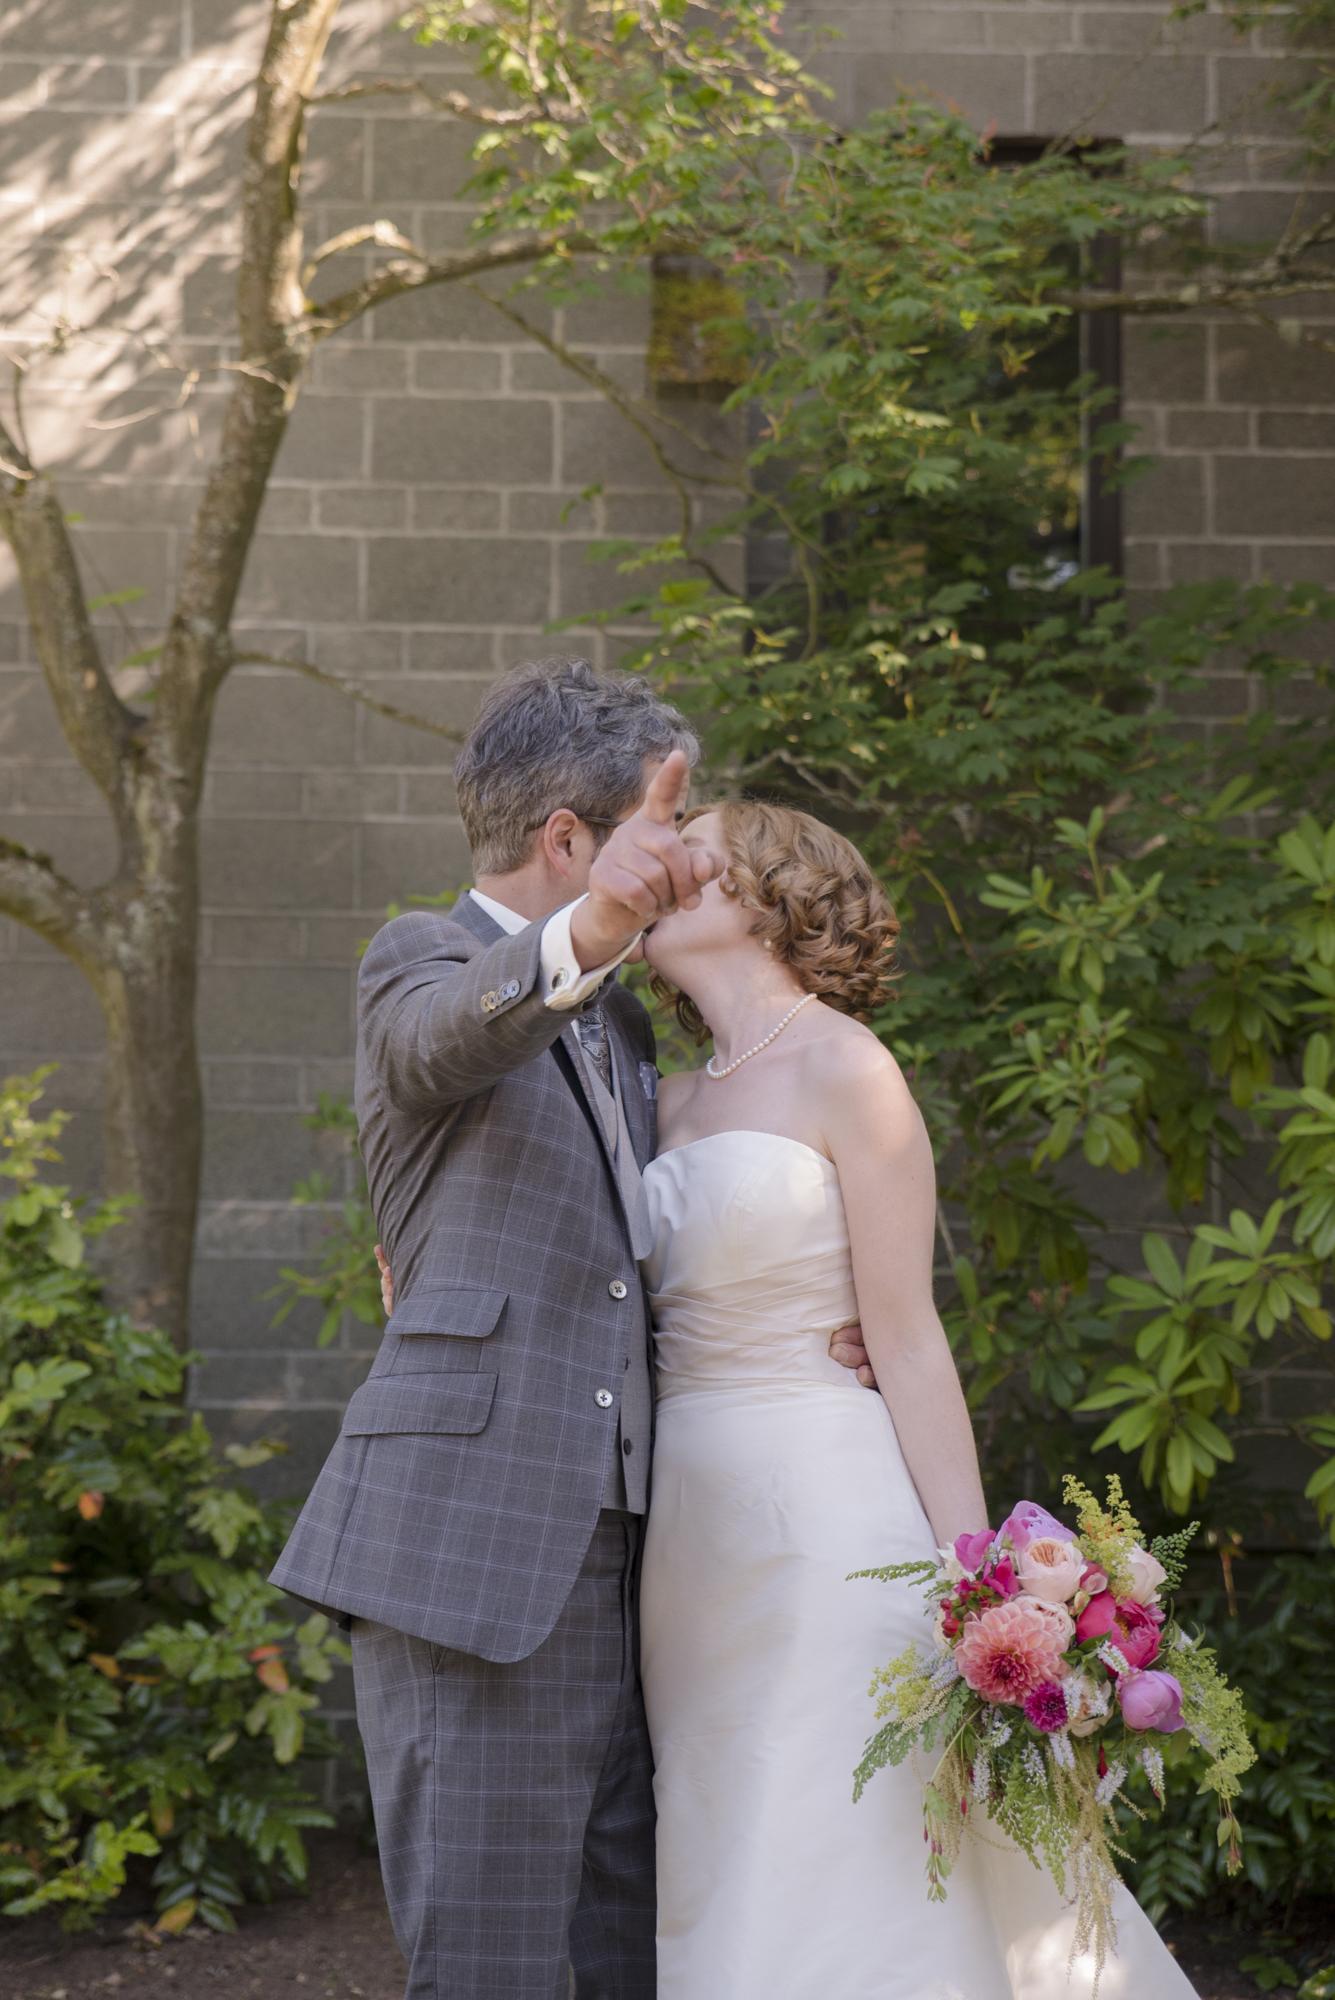 arthousephotographs.com   Los Angeles Wedding Photographer   Memphis Wedding Photographer   Nashville Wedding Photographer   Arthouse Photographs